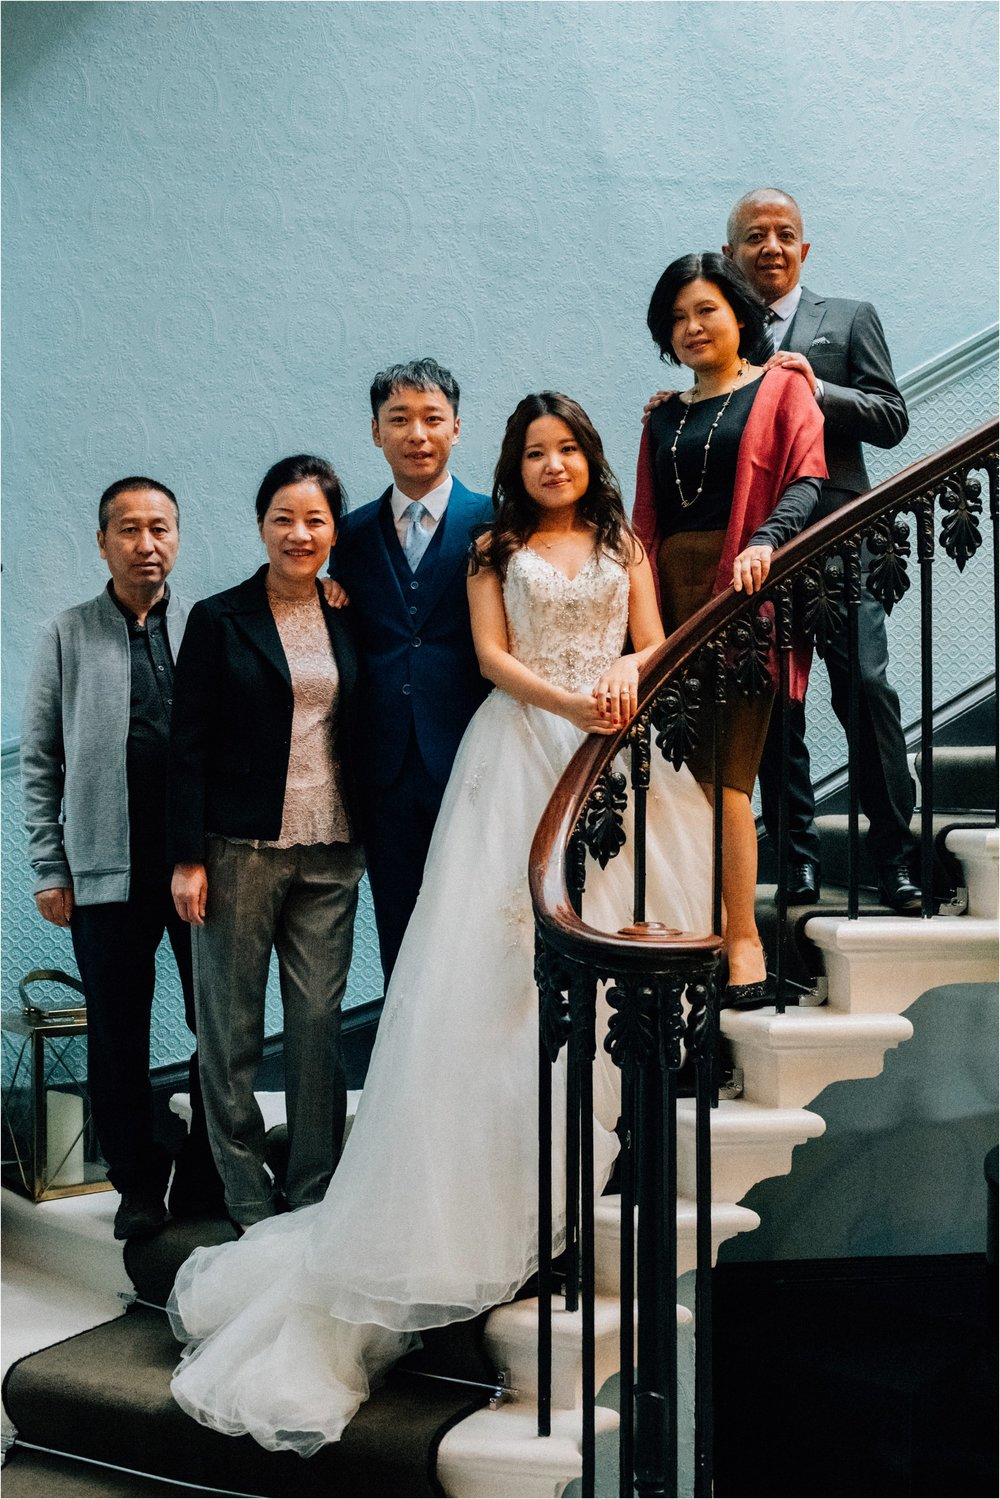 York city elopement wedding photographer_0040.jpg